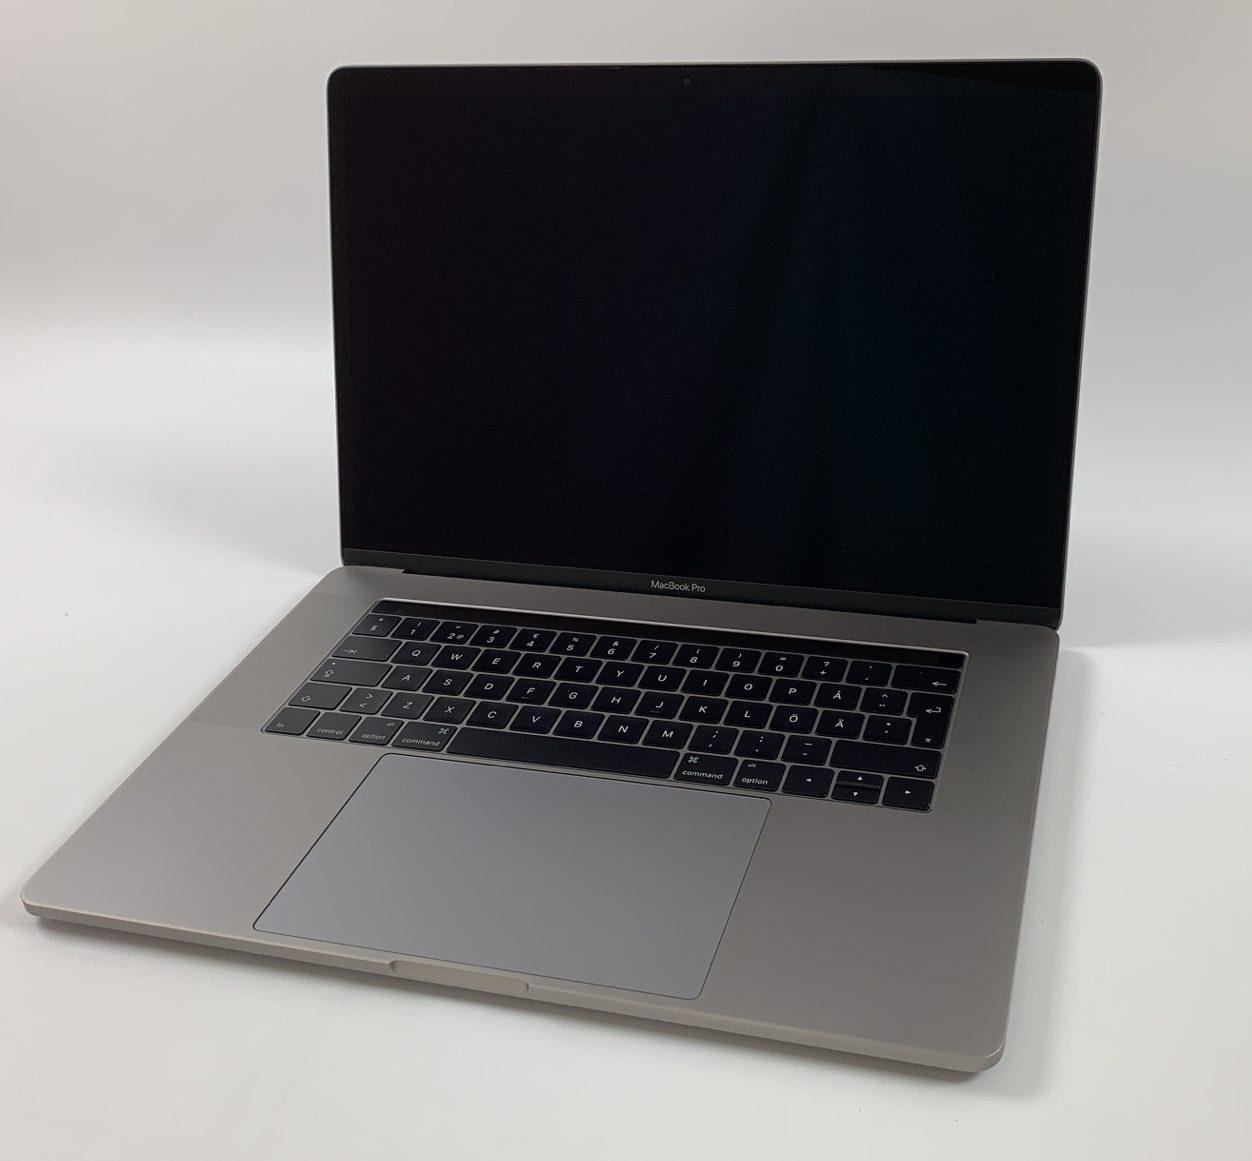 "MacBook Pro 15"" Touch Bar Late 2016 (Intel Quad-Core i7 2.6 GHz 16 GB RAM 256 GB SSD), Space Gray, Intel Quad-Core i7 2.6 GHz, 16 GB RAM, 256 GB SSD, Kuva 1"